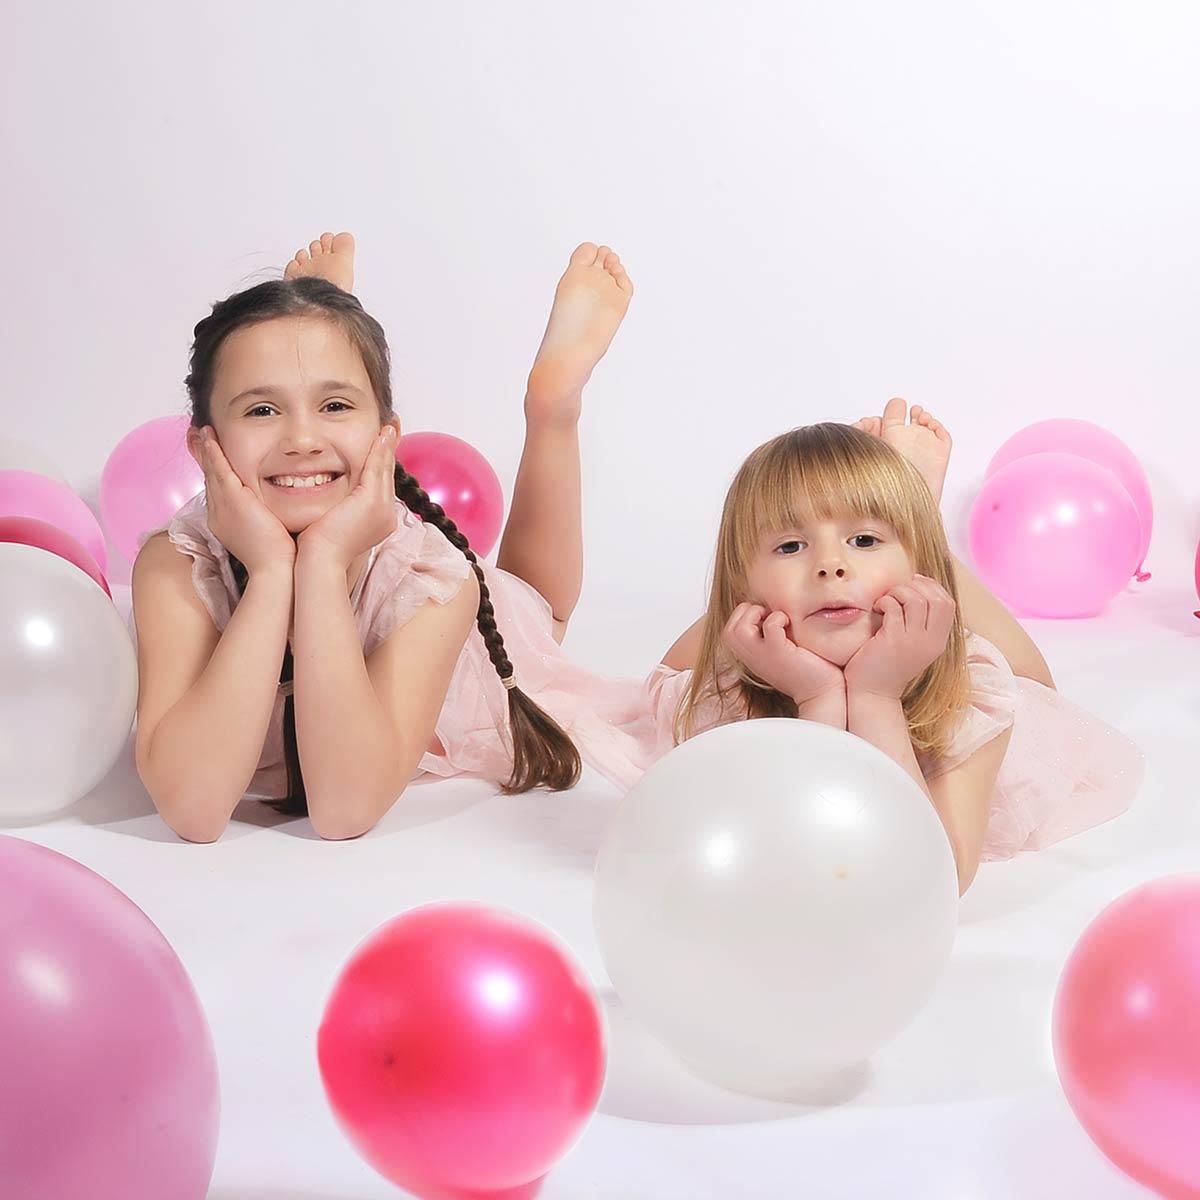 Kinder&Luftballons-Kopie